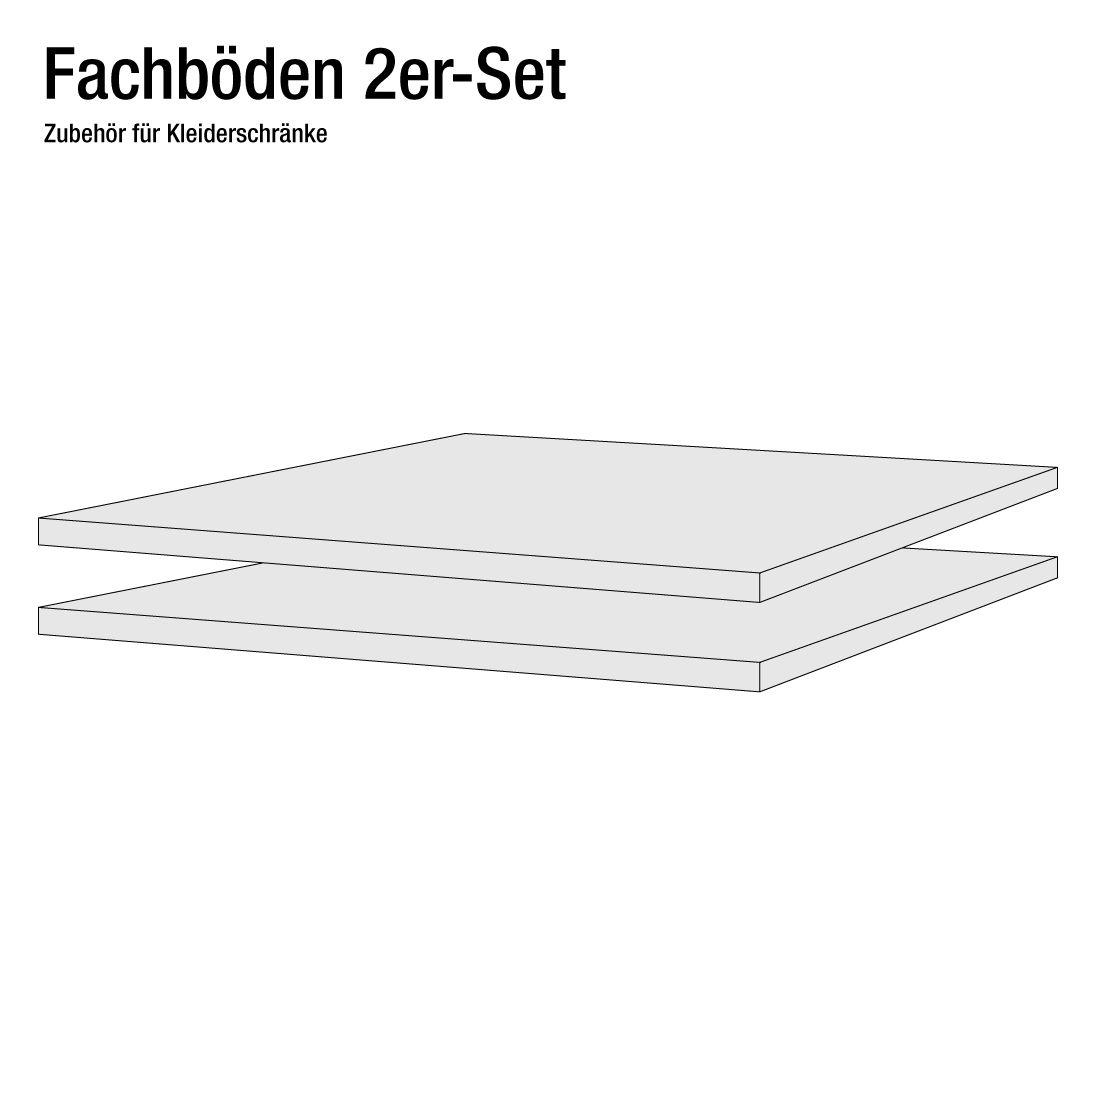 50er Fachboden (2er-Set) – fresh to go, fresh to go kaufen